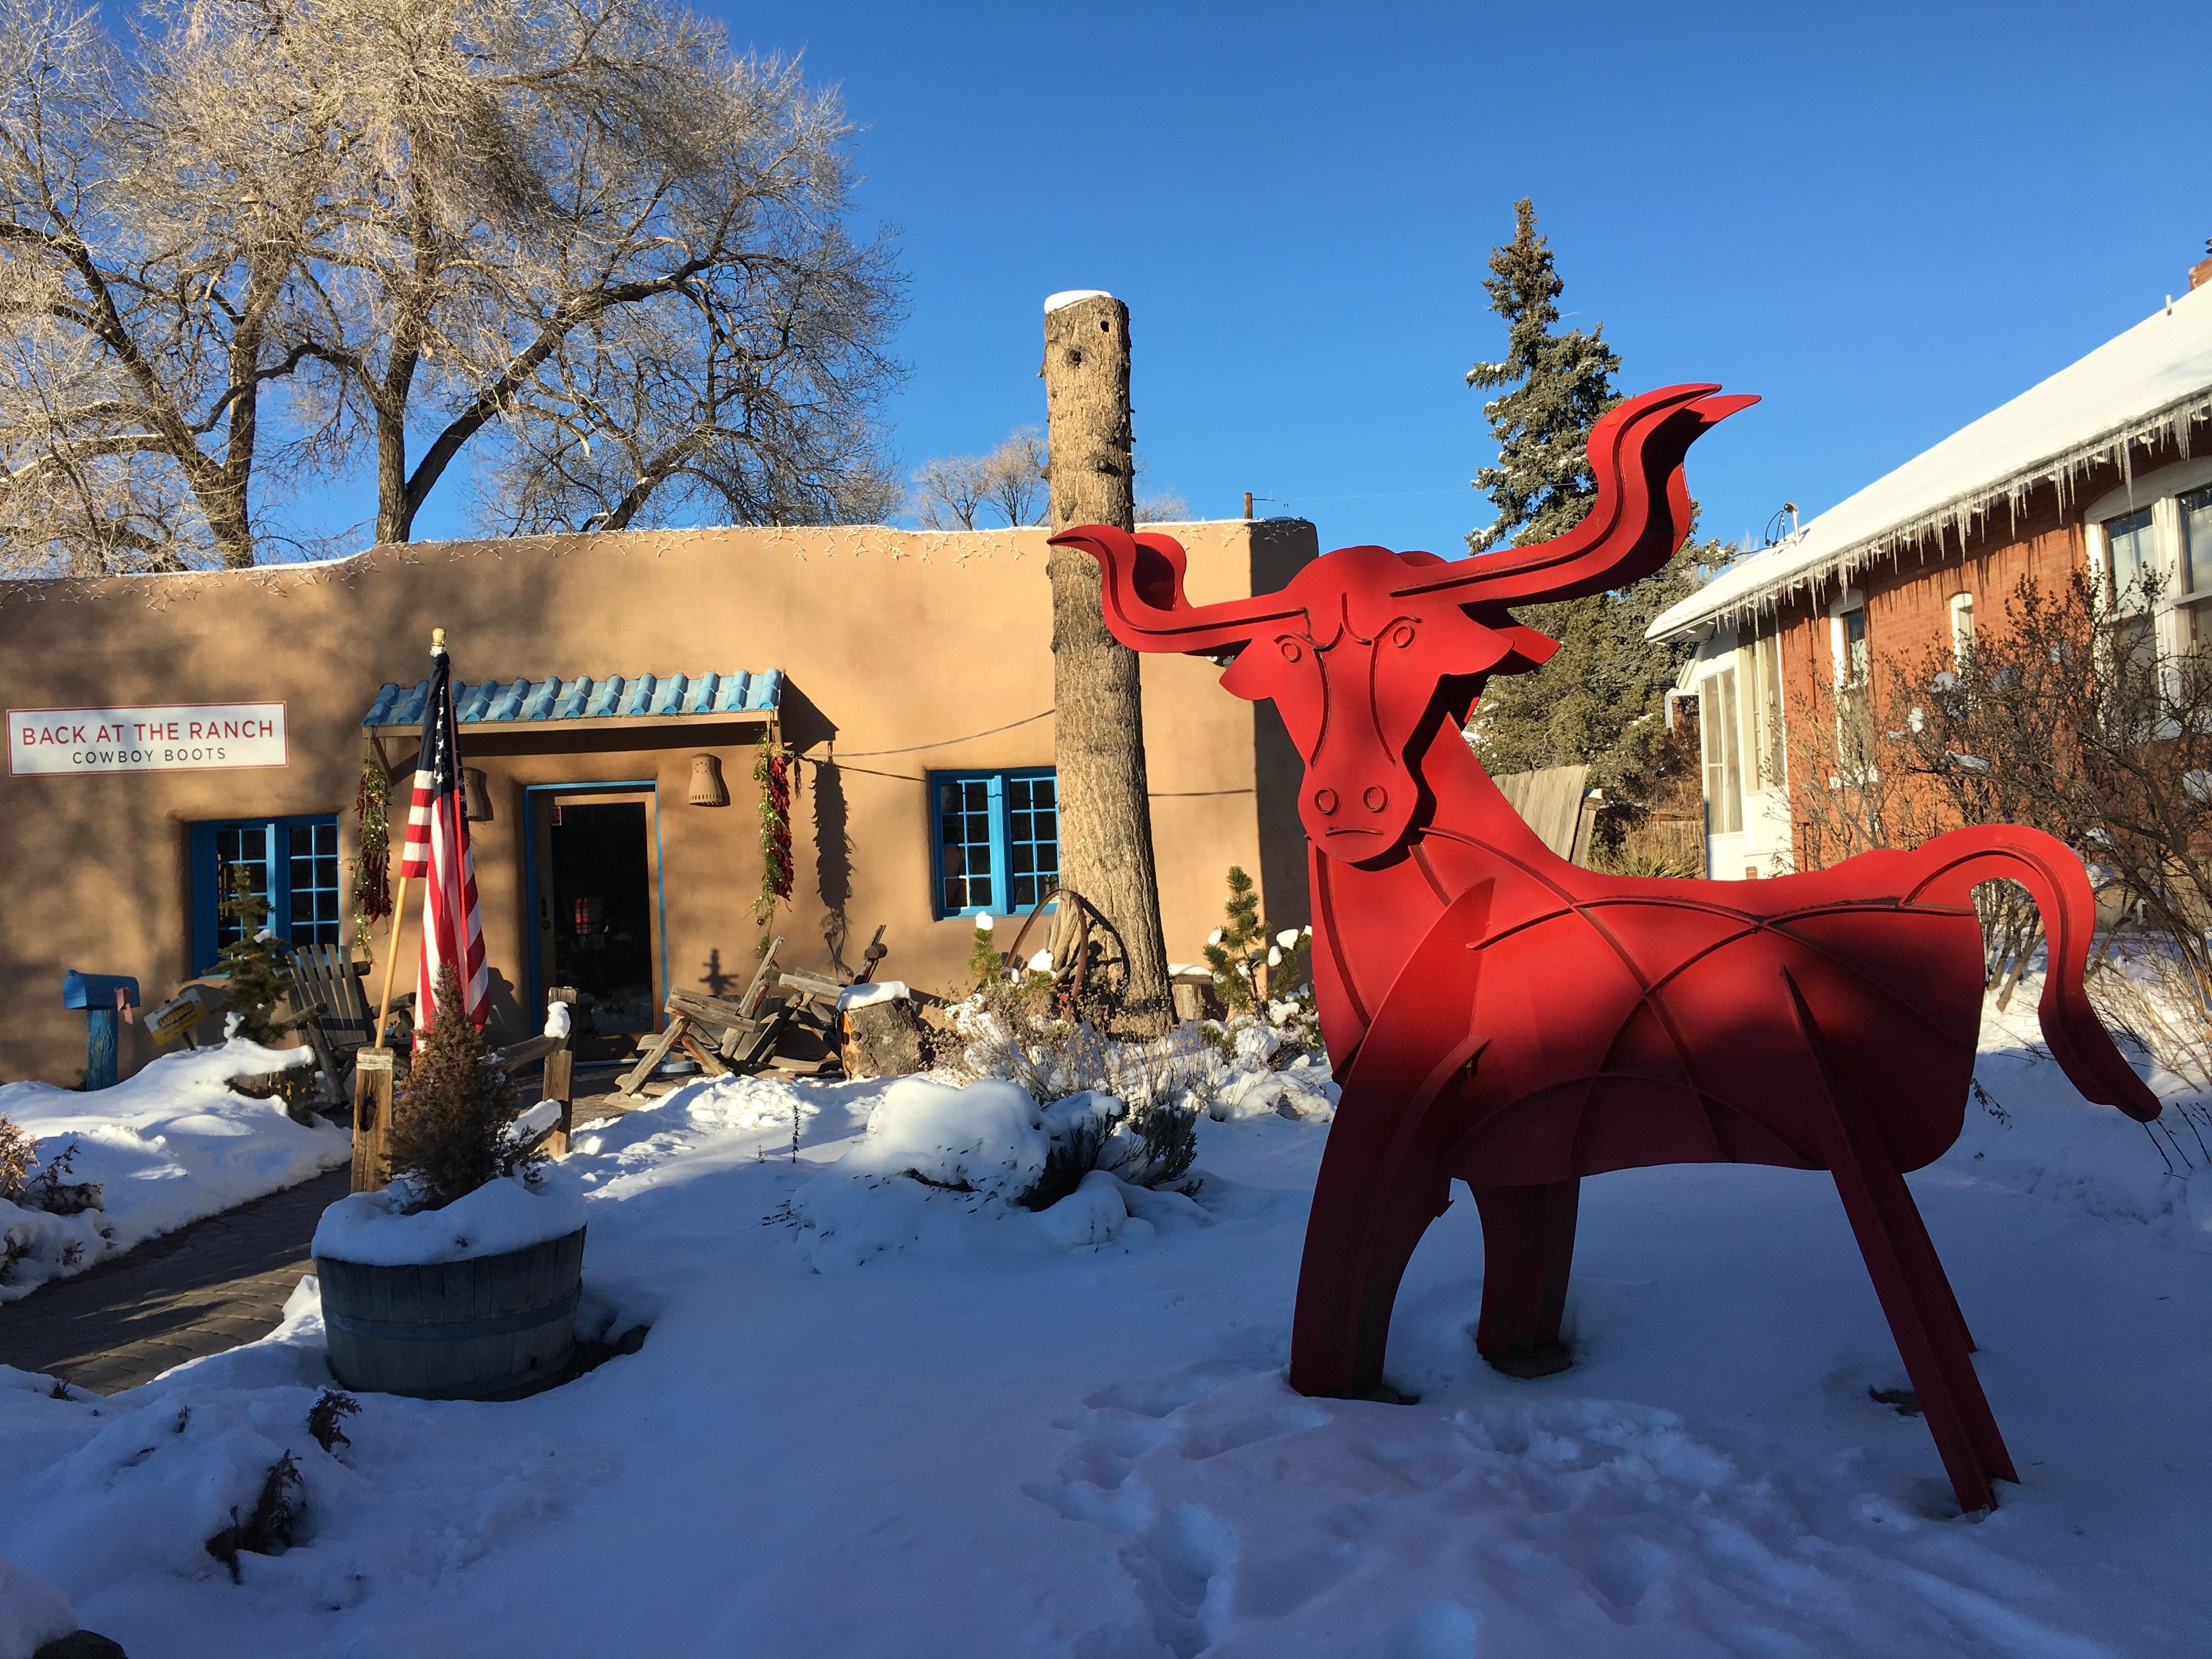 Santa Fe, NM | In Search of a Scoop